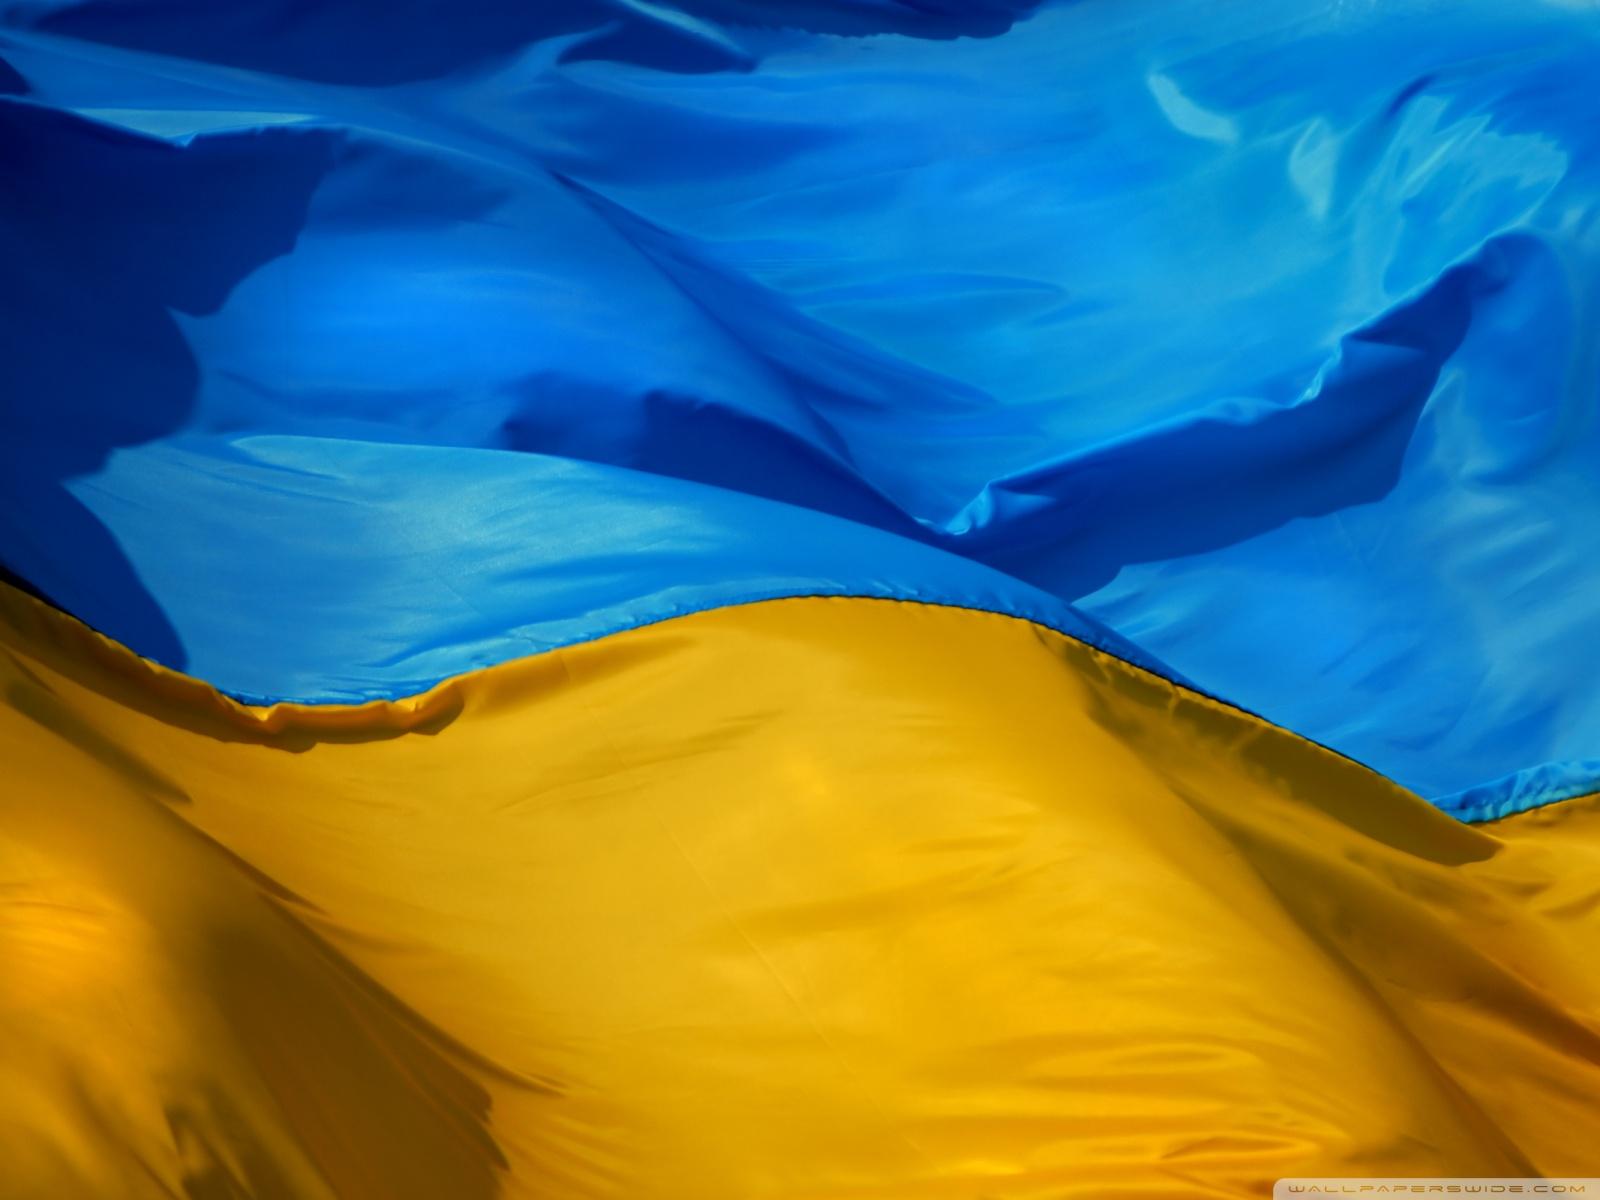 Free Ukraine flag phone wallpaper by cboal32